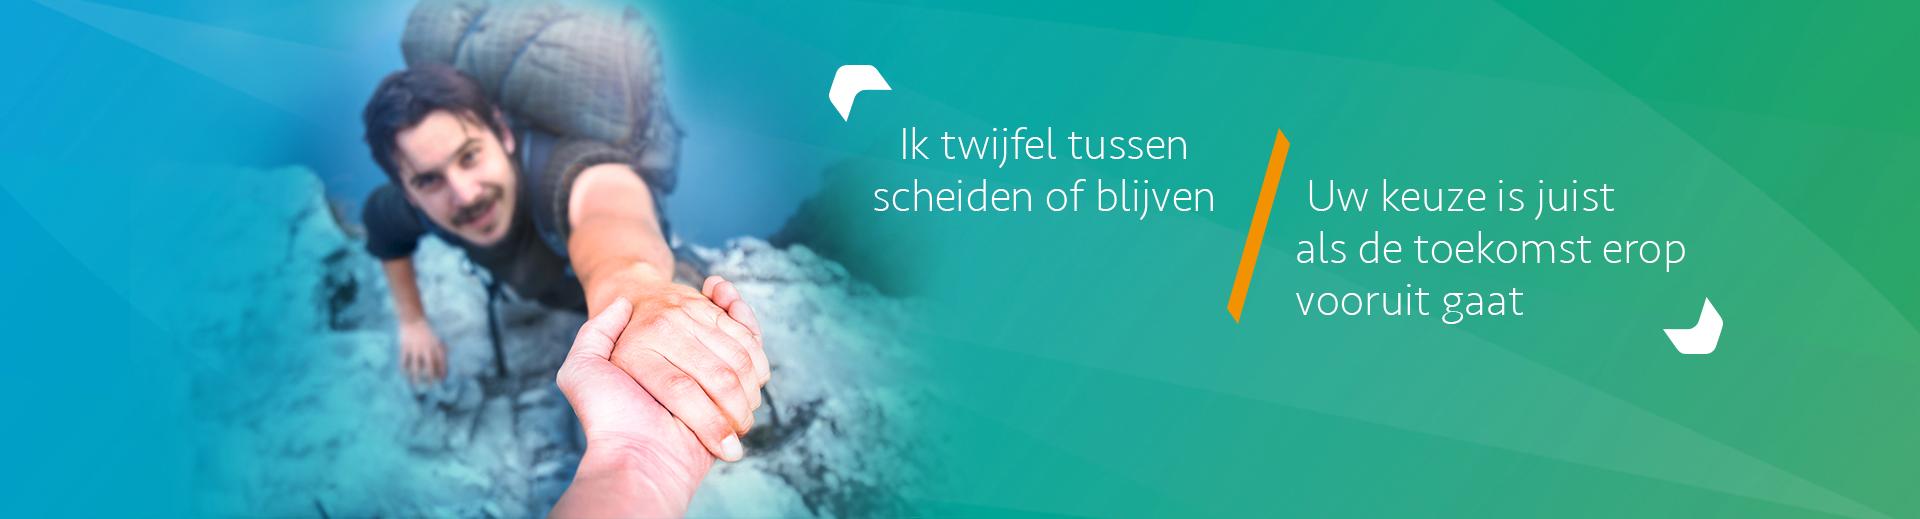 Wel of niet scheiden - Scheidingsplanner Midden-Nederland